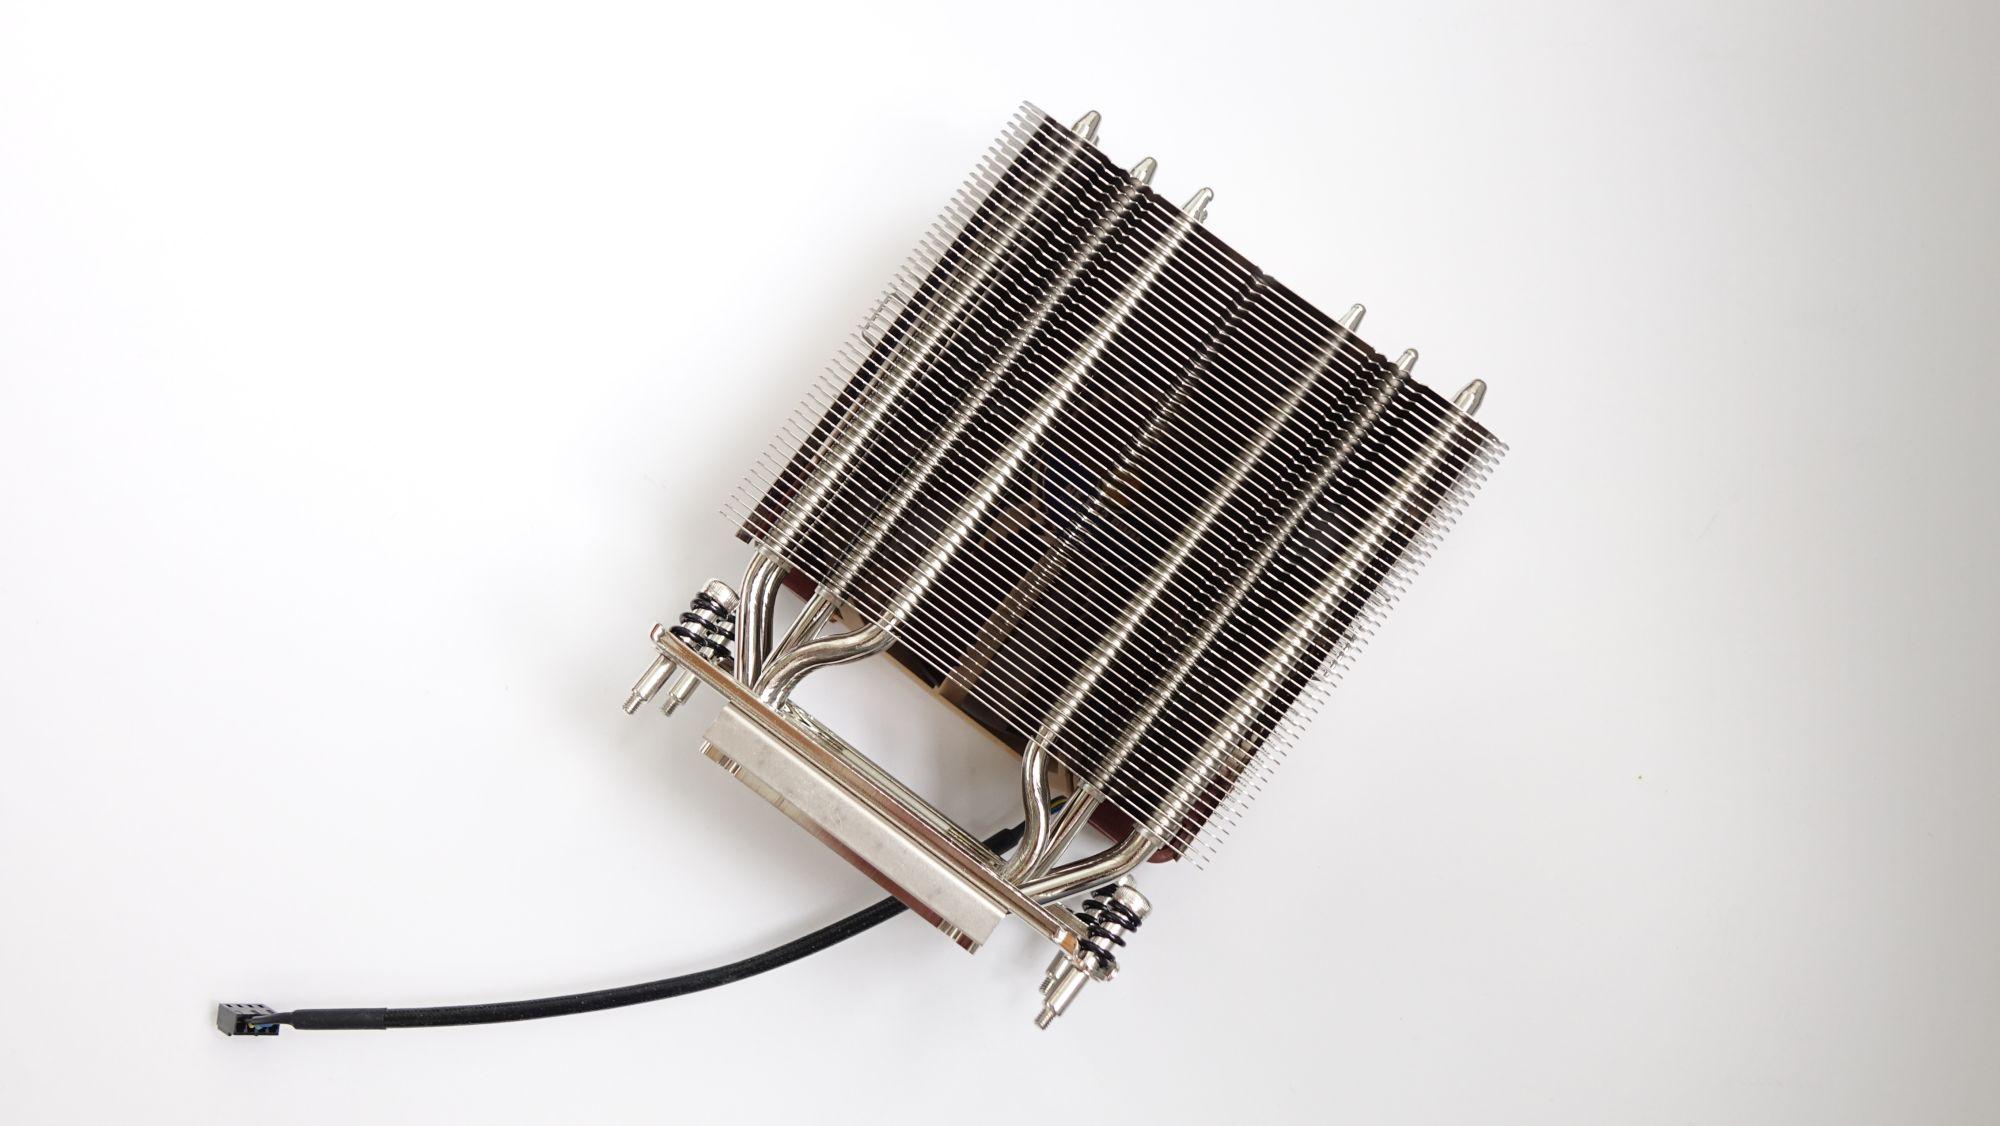 NH-U12S TR4-SP3 радиатор